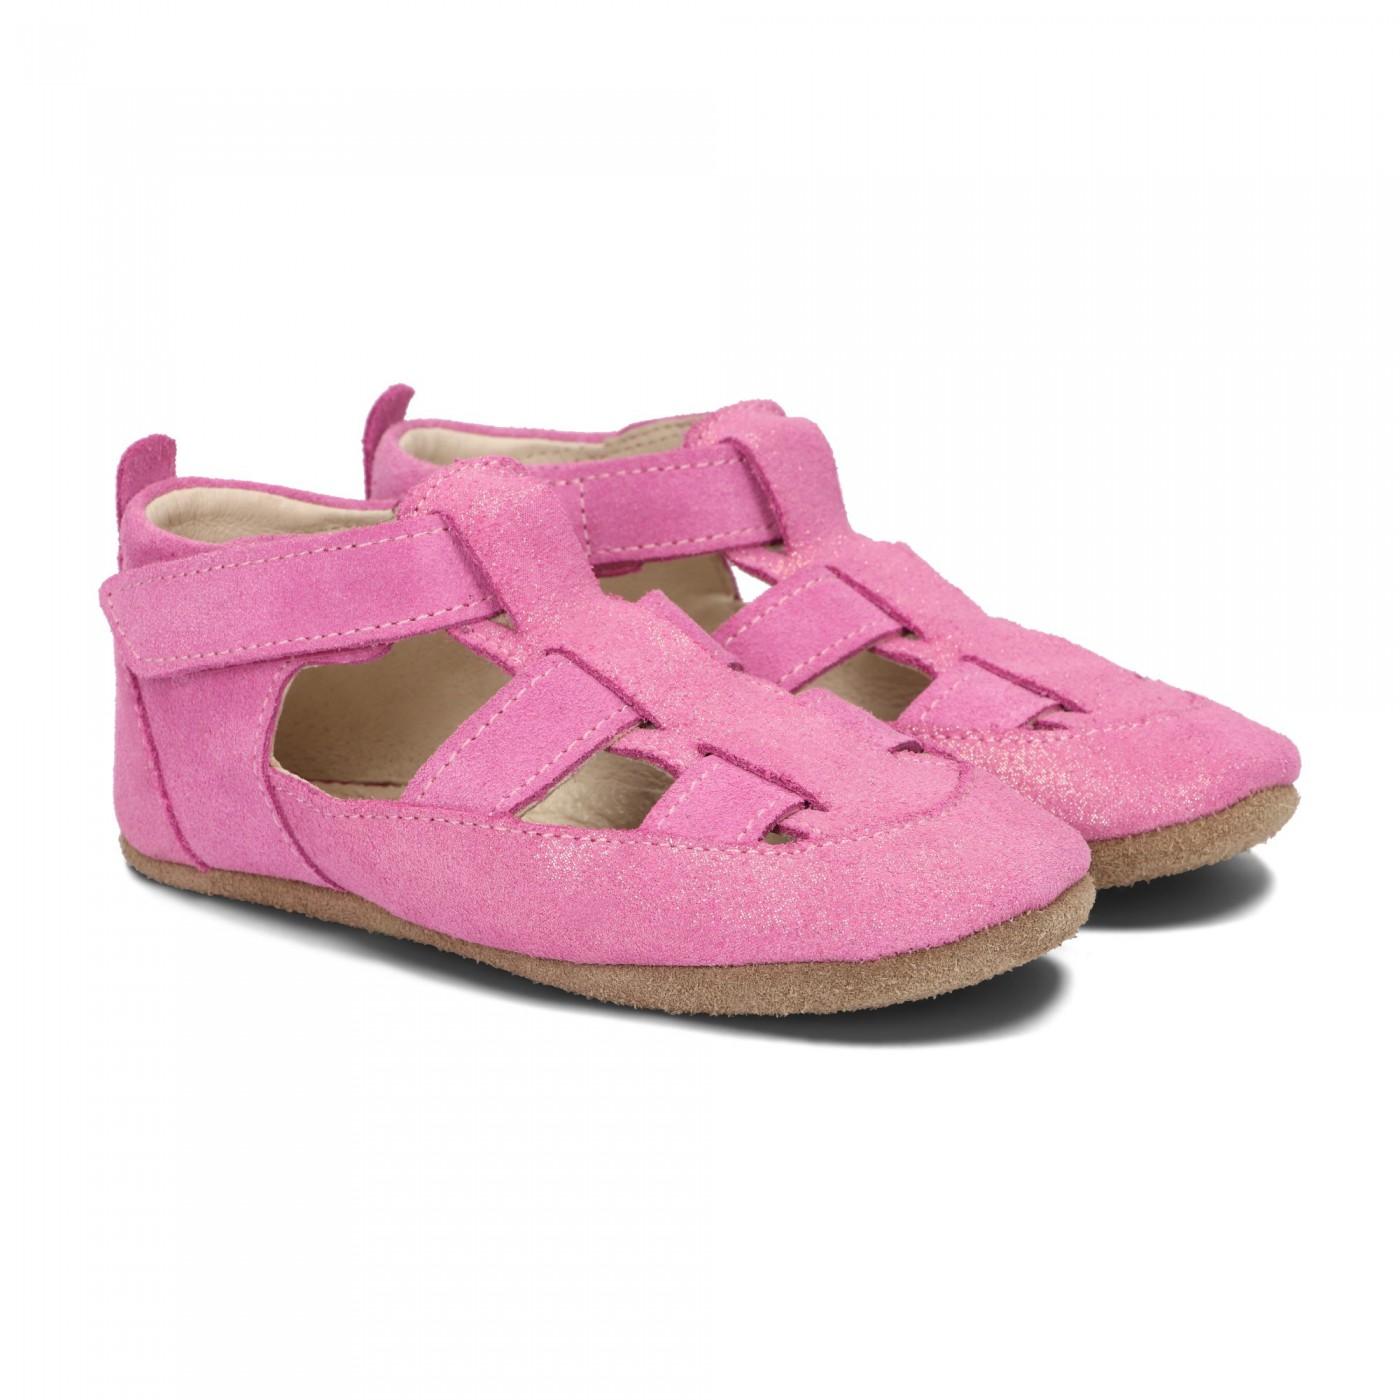 Pantofelki Barefoot różowy pyłek